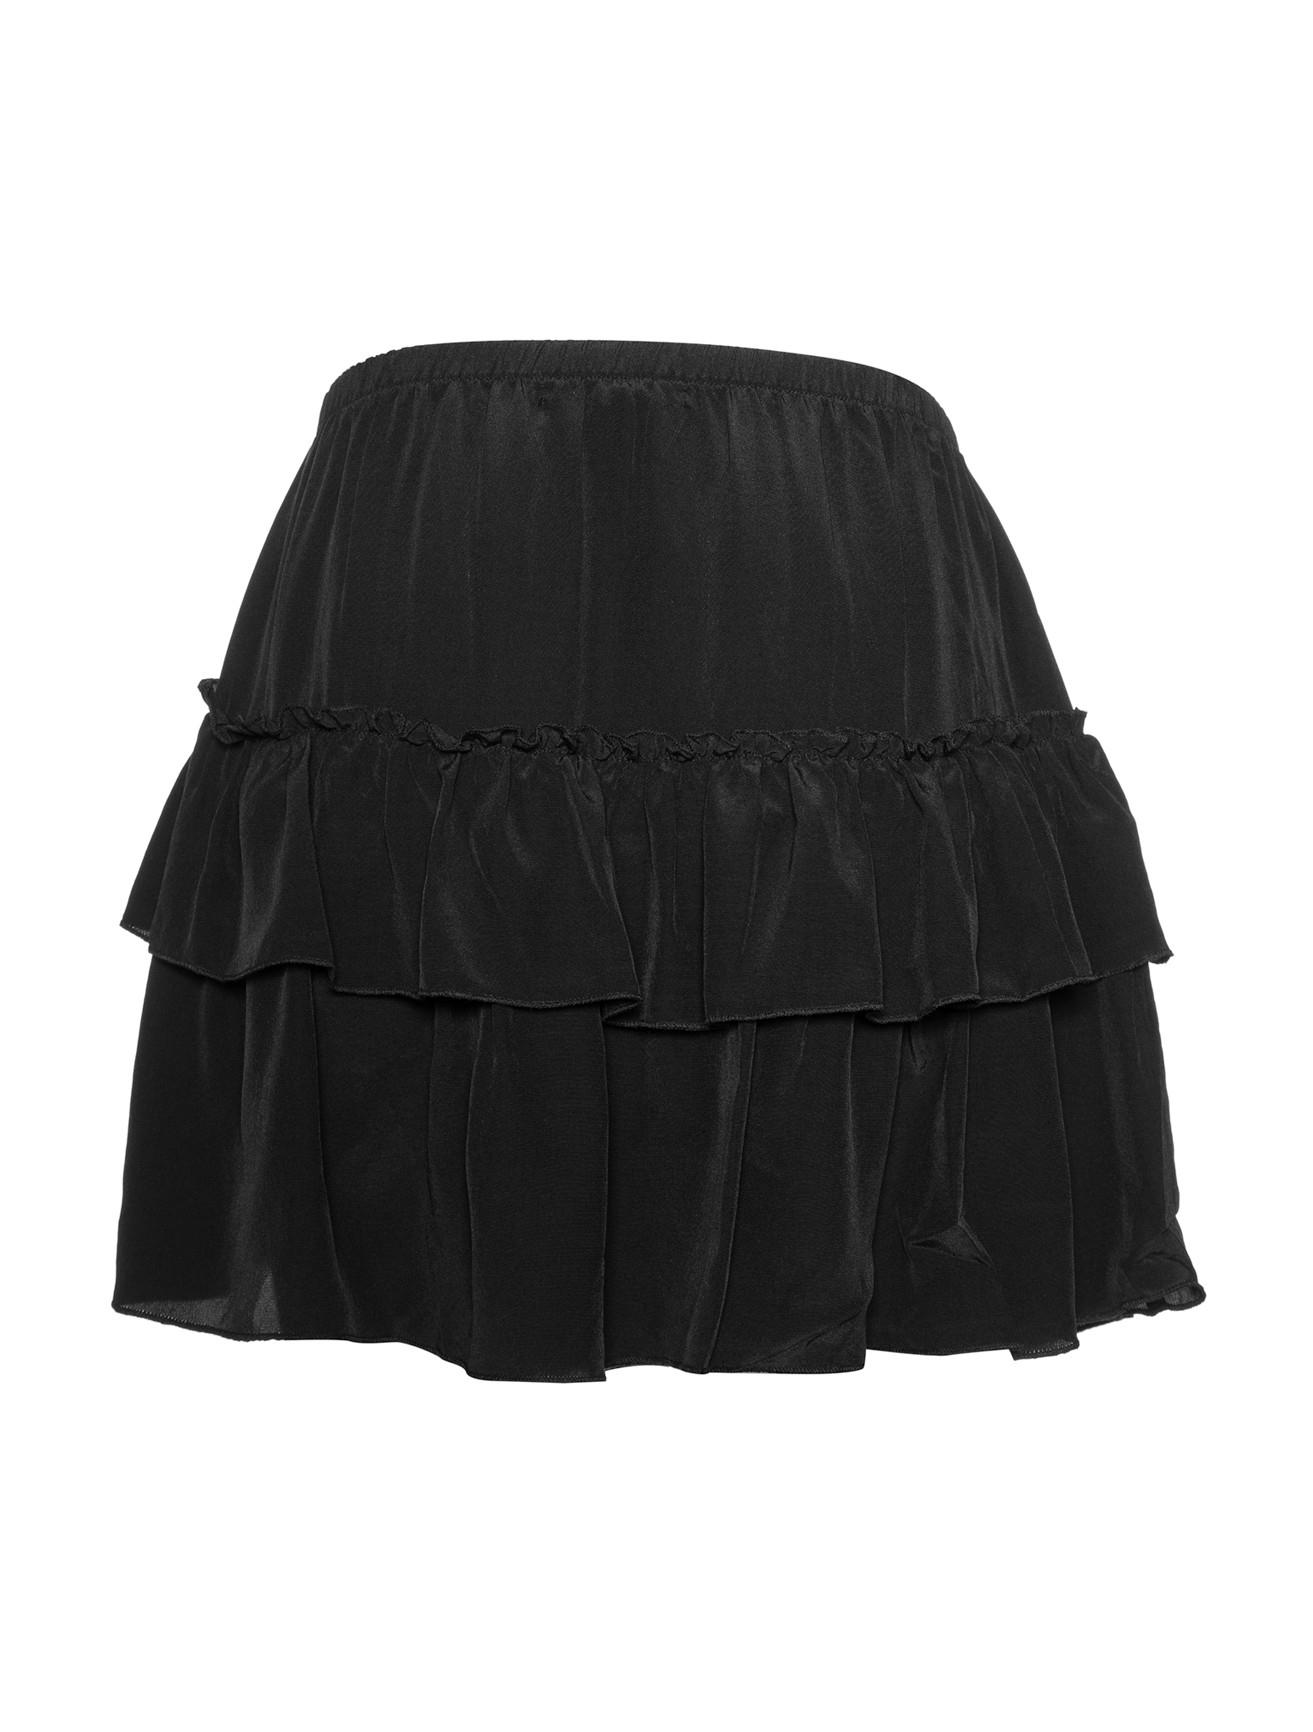 Silk ruffle skirt